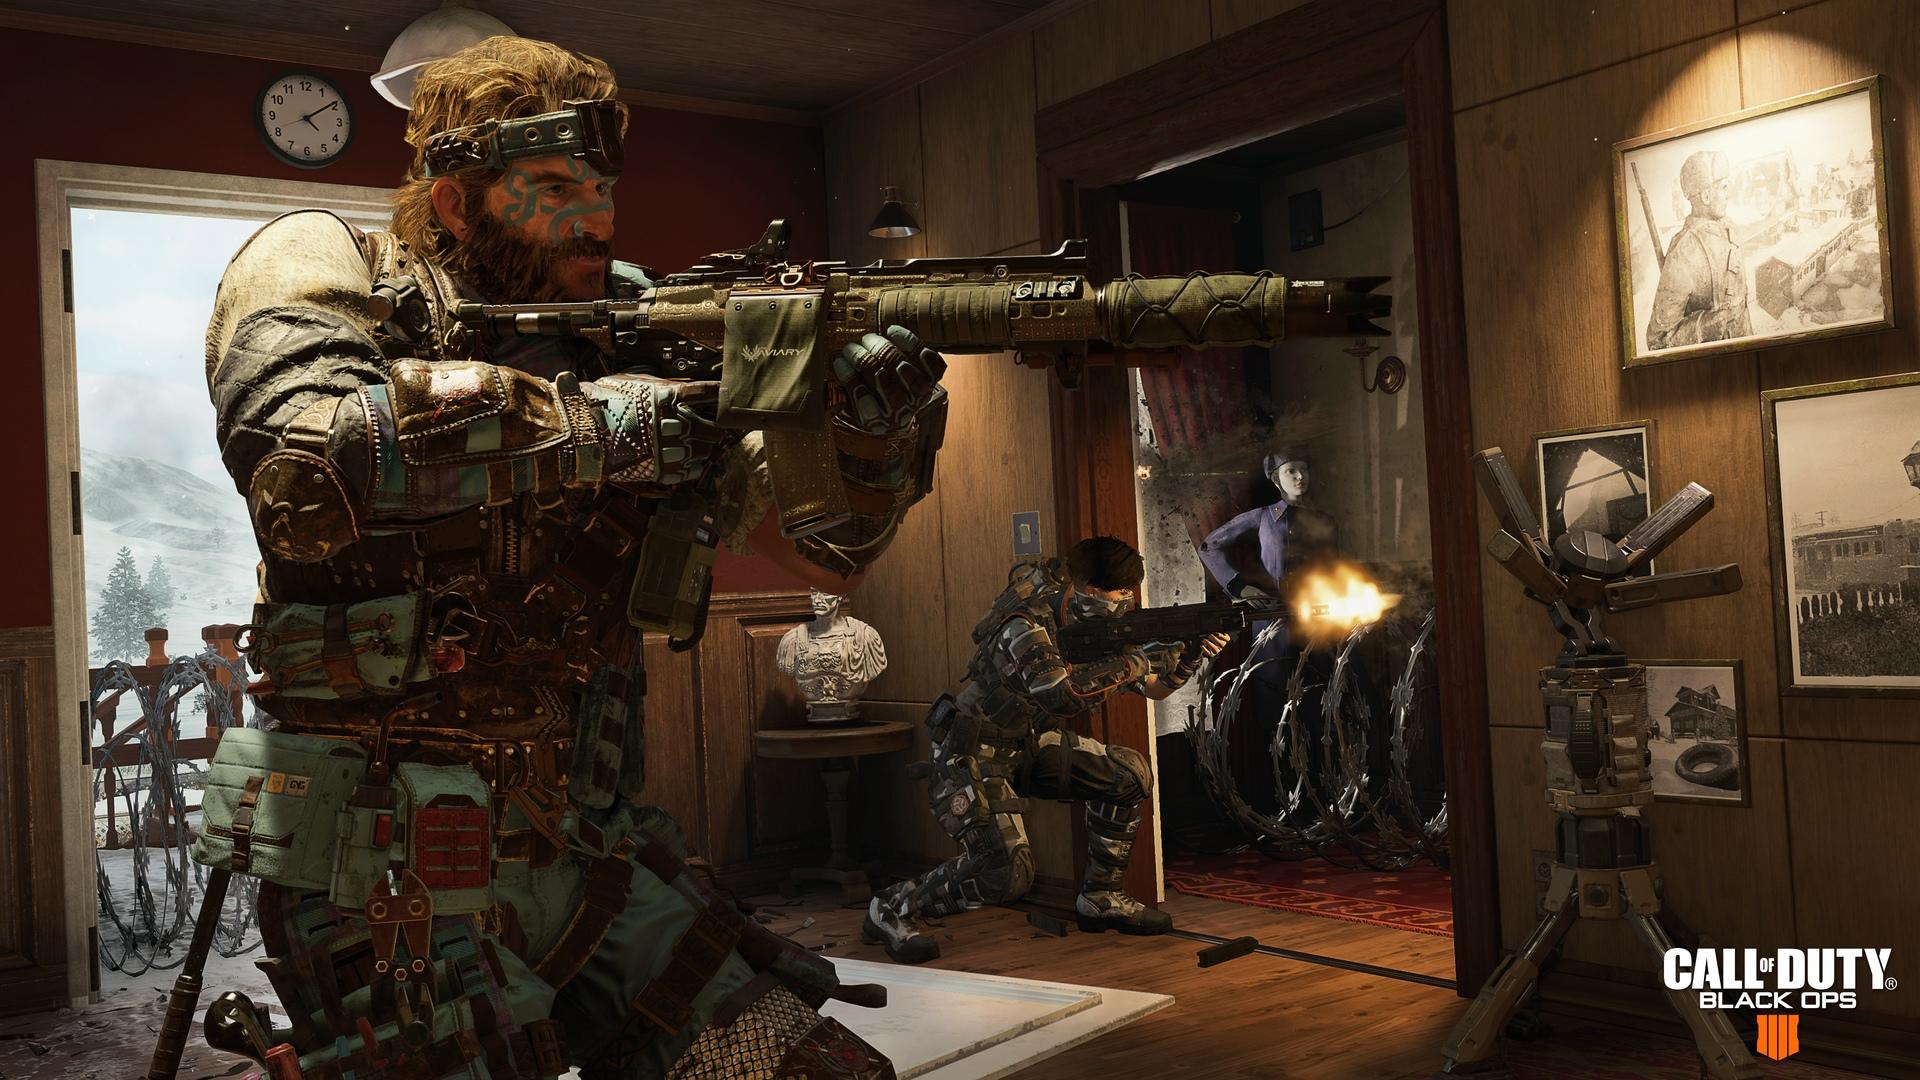 1920x1080 Nuketown Call Of Duty Black Ops 4 Laptop Full HD ...